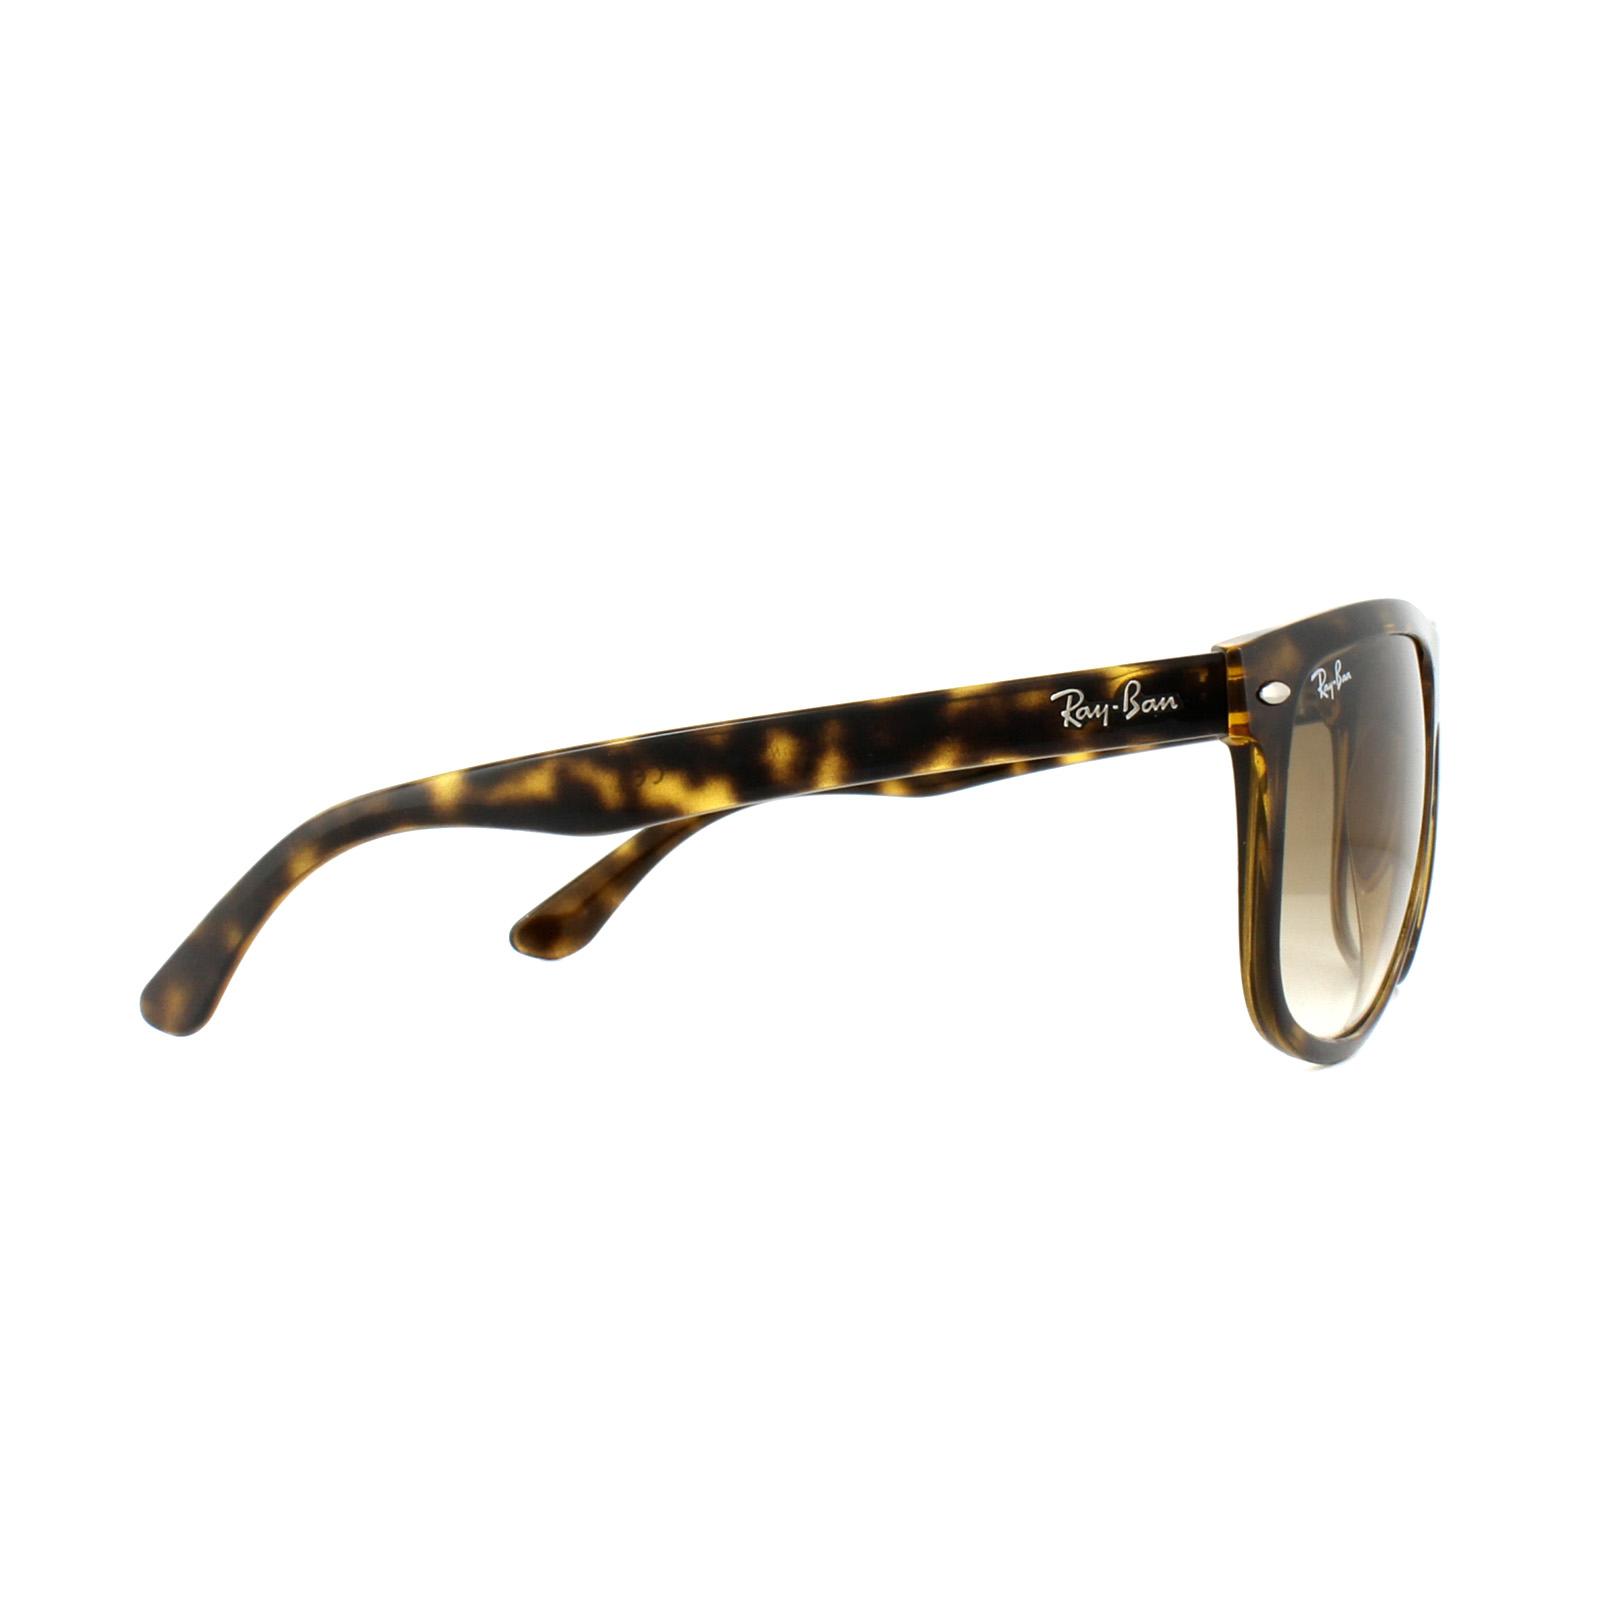 5205f69b5ec Sentinel Ray-Ban Sunglasses 4147 Light Havana Brown Gradient 710 51 Large  60mm